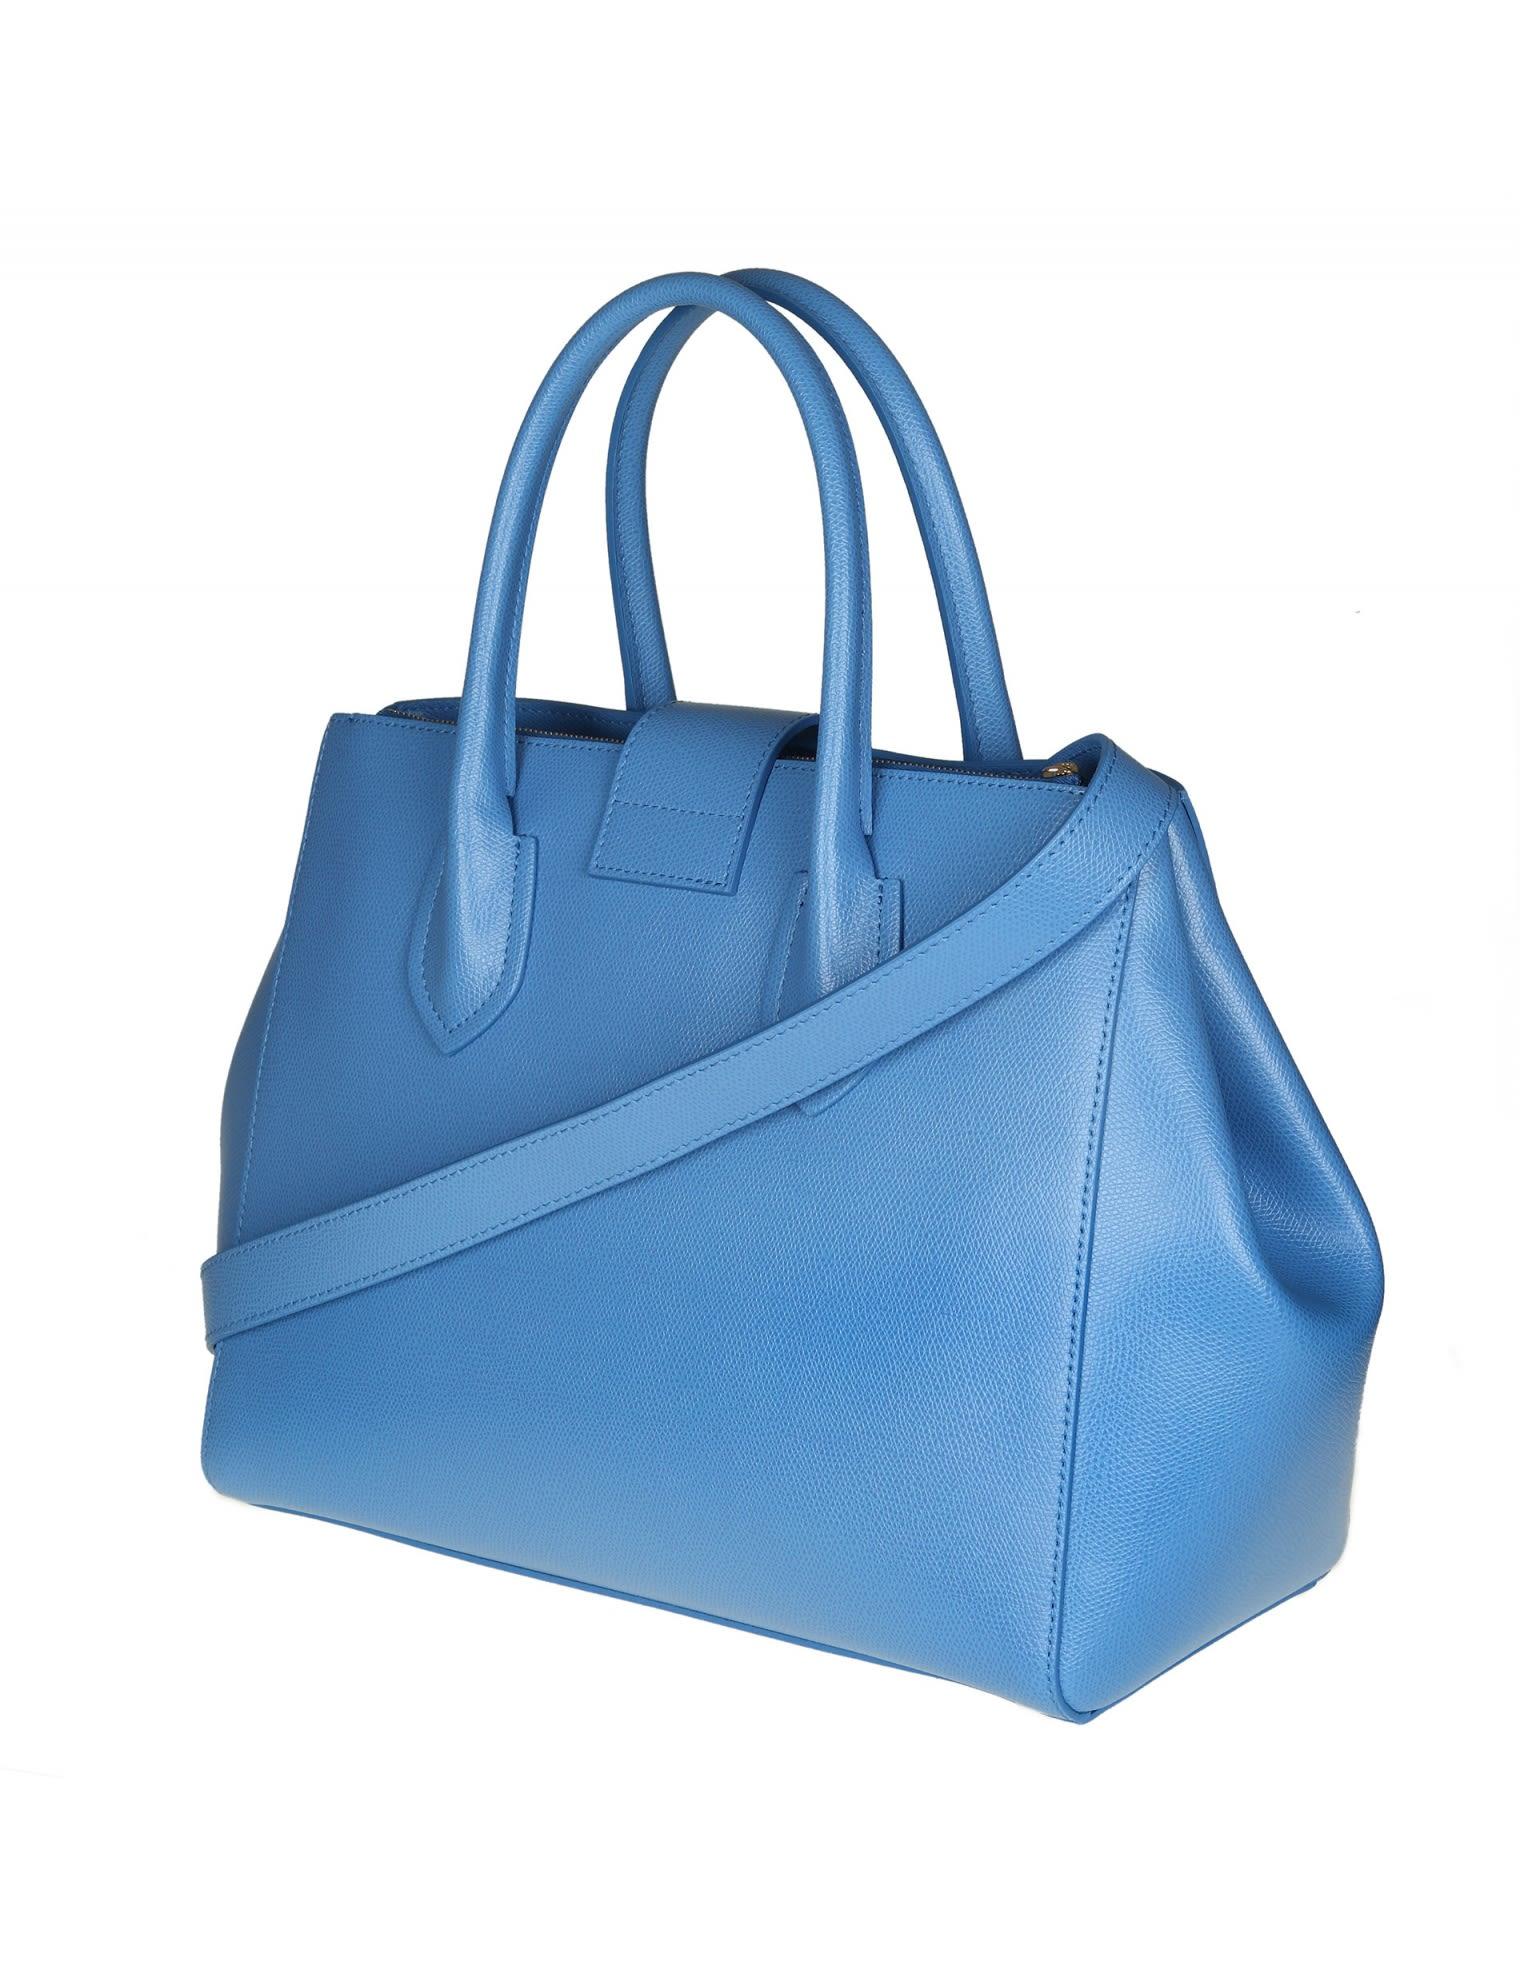 Furla Metropolis M sky blue leather bag OZweZAM